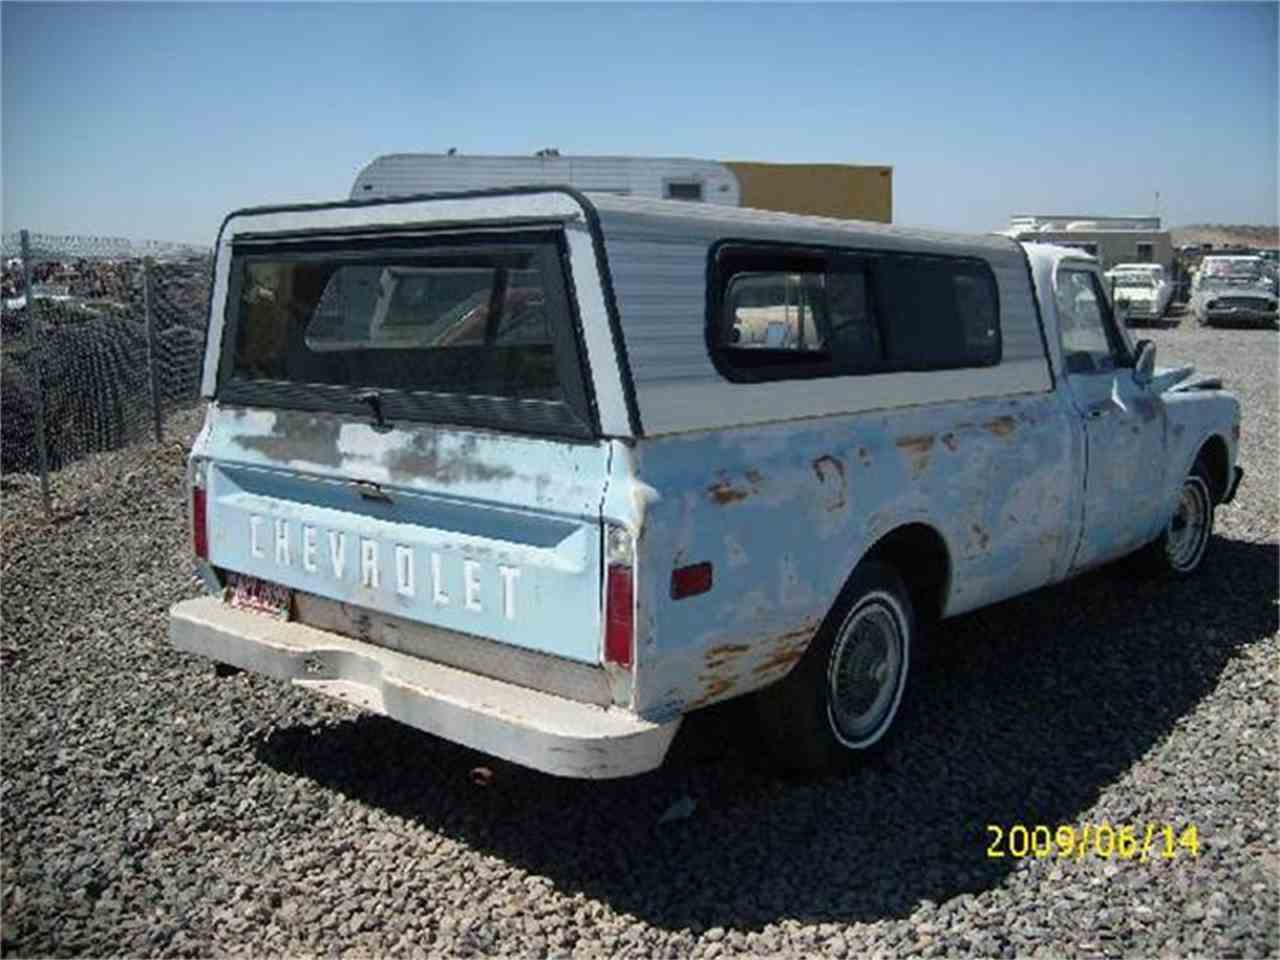 Chevrolet Dealers Phoenix Arizona Chevrolet Antique For Sale - Chevrolet dealers phoenix arizona